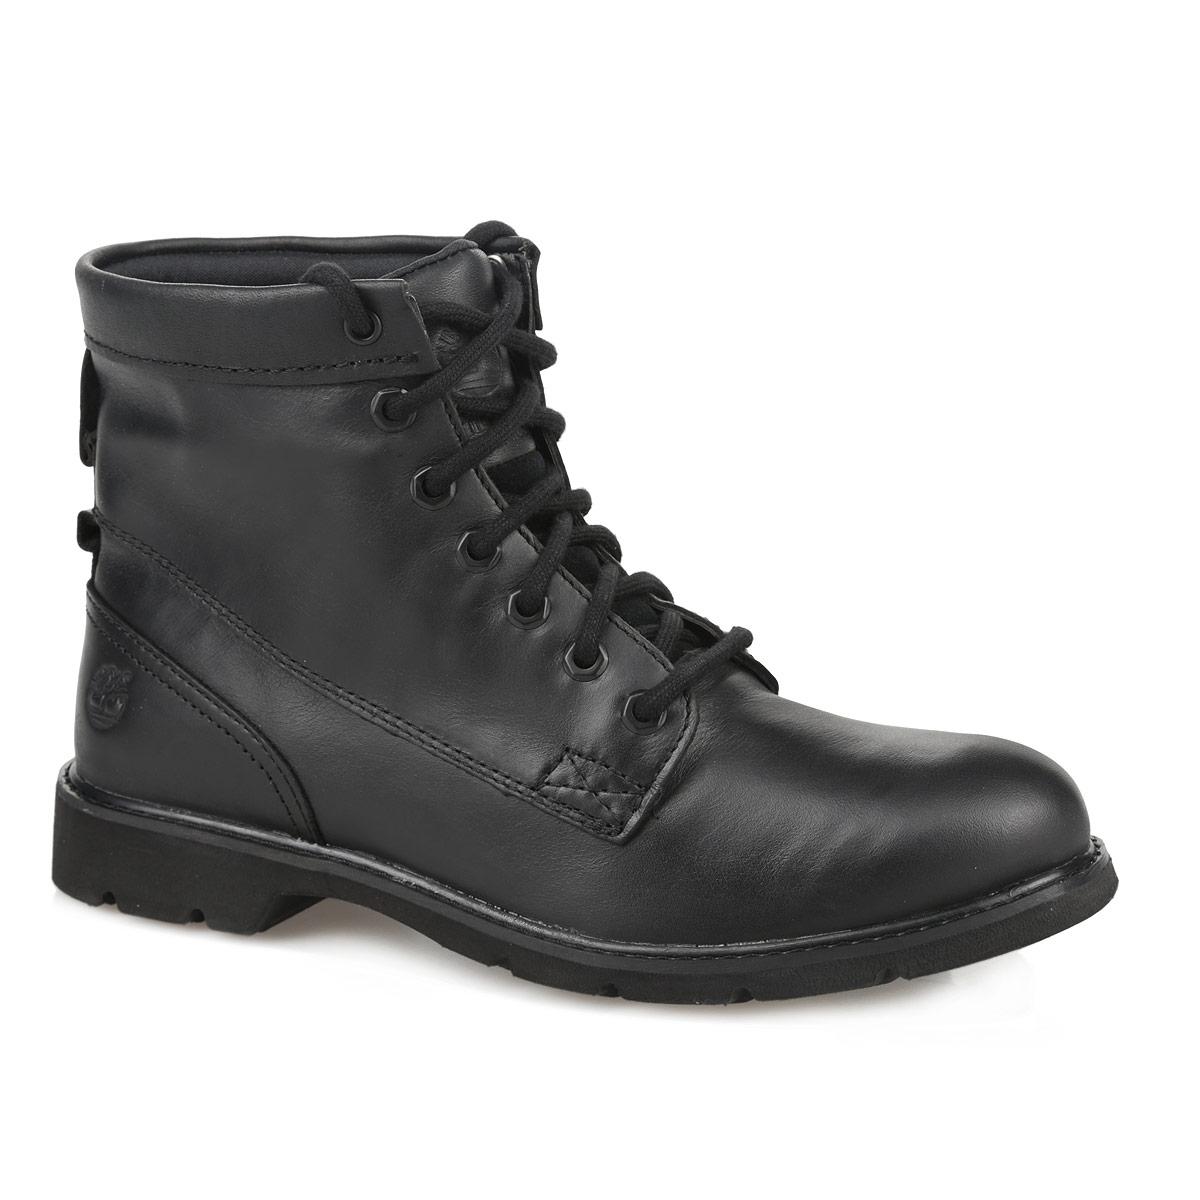 Timberland Ботинки женские 6-inch Lace-Up Waterproof Boot. TBLA11J3W